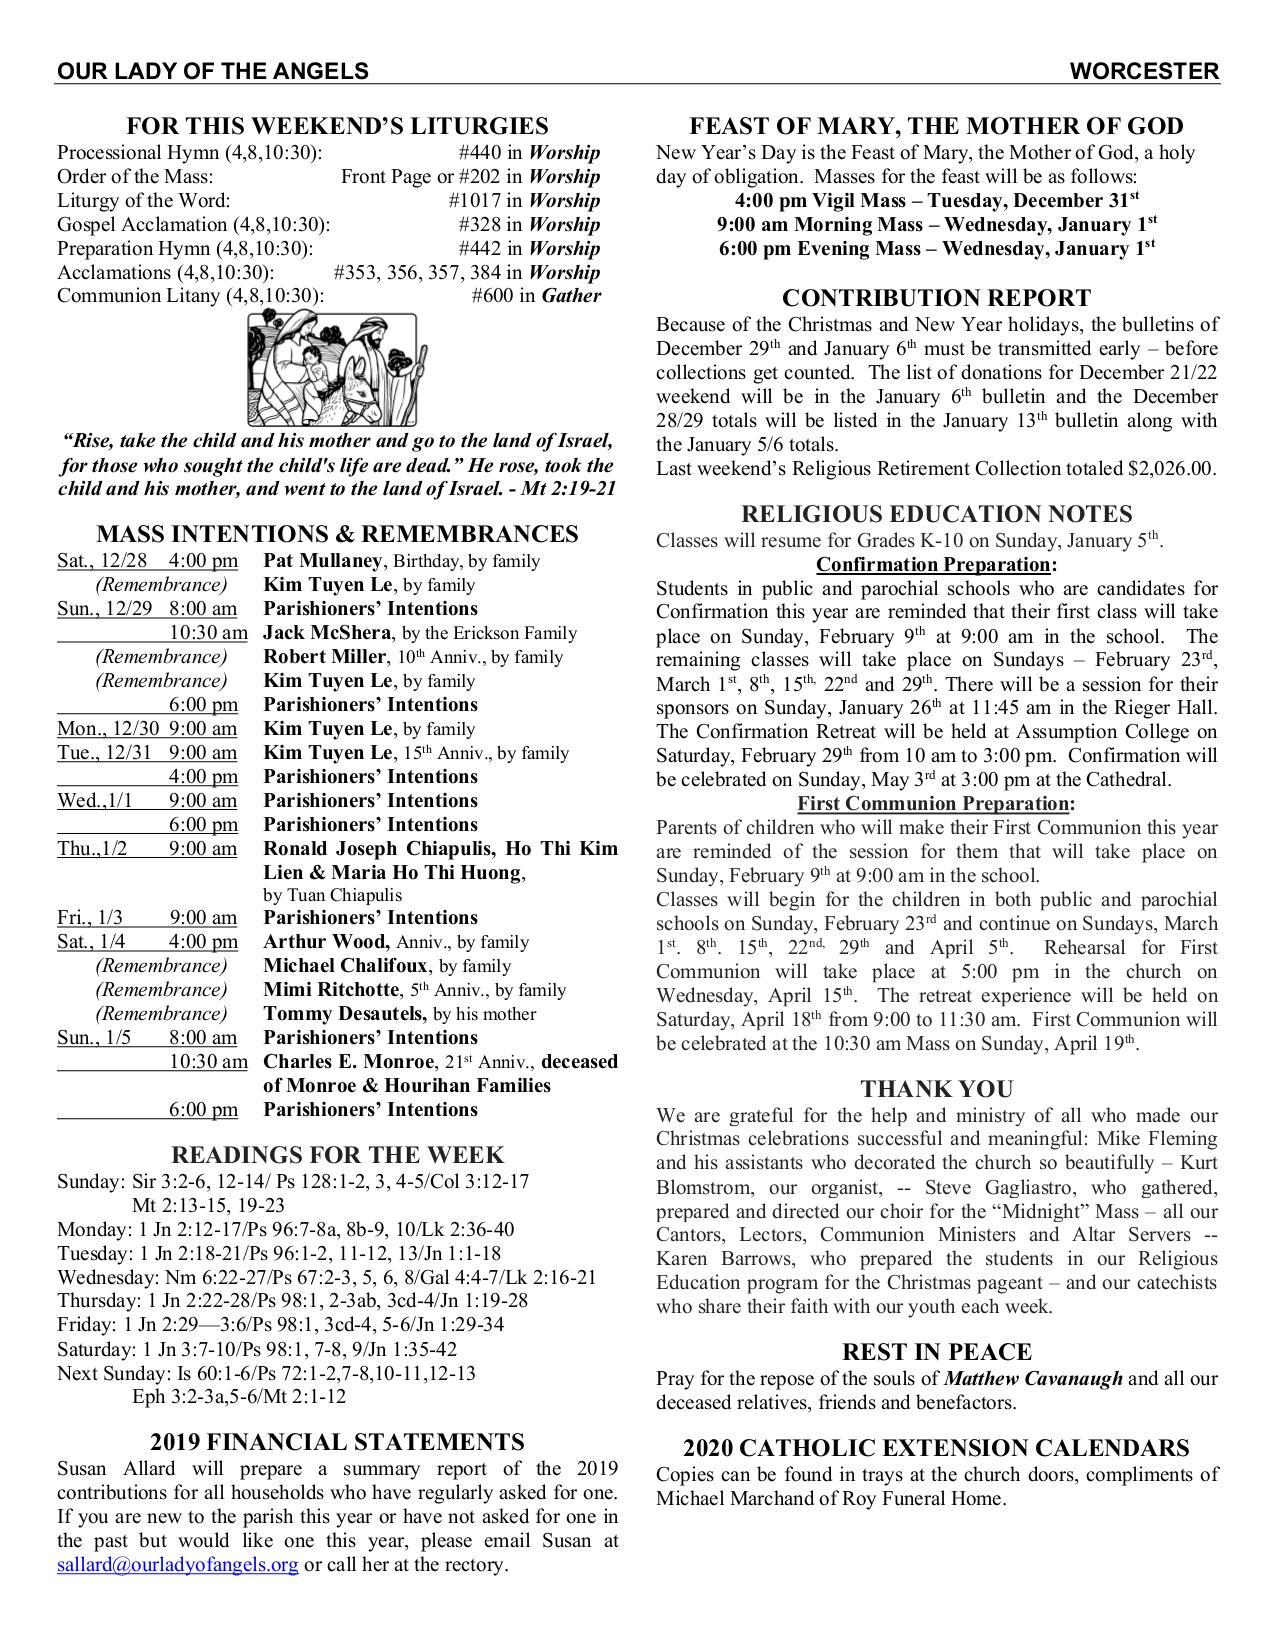 Bulletin in Catholic Extension Calendar